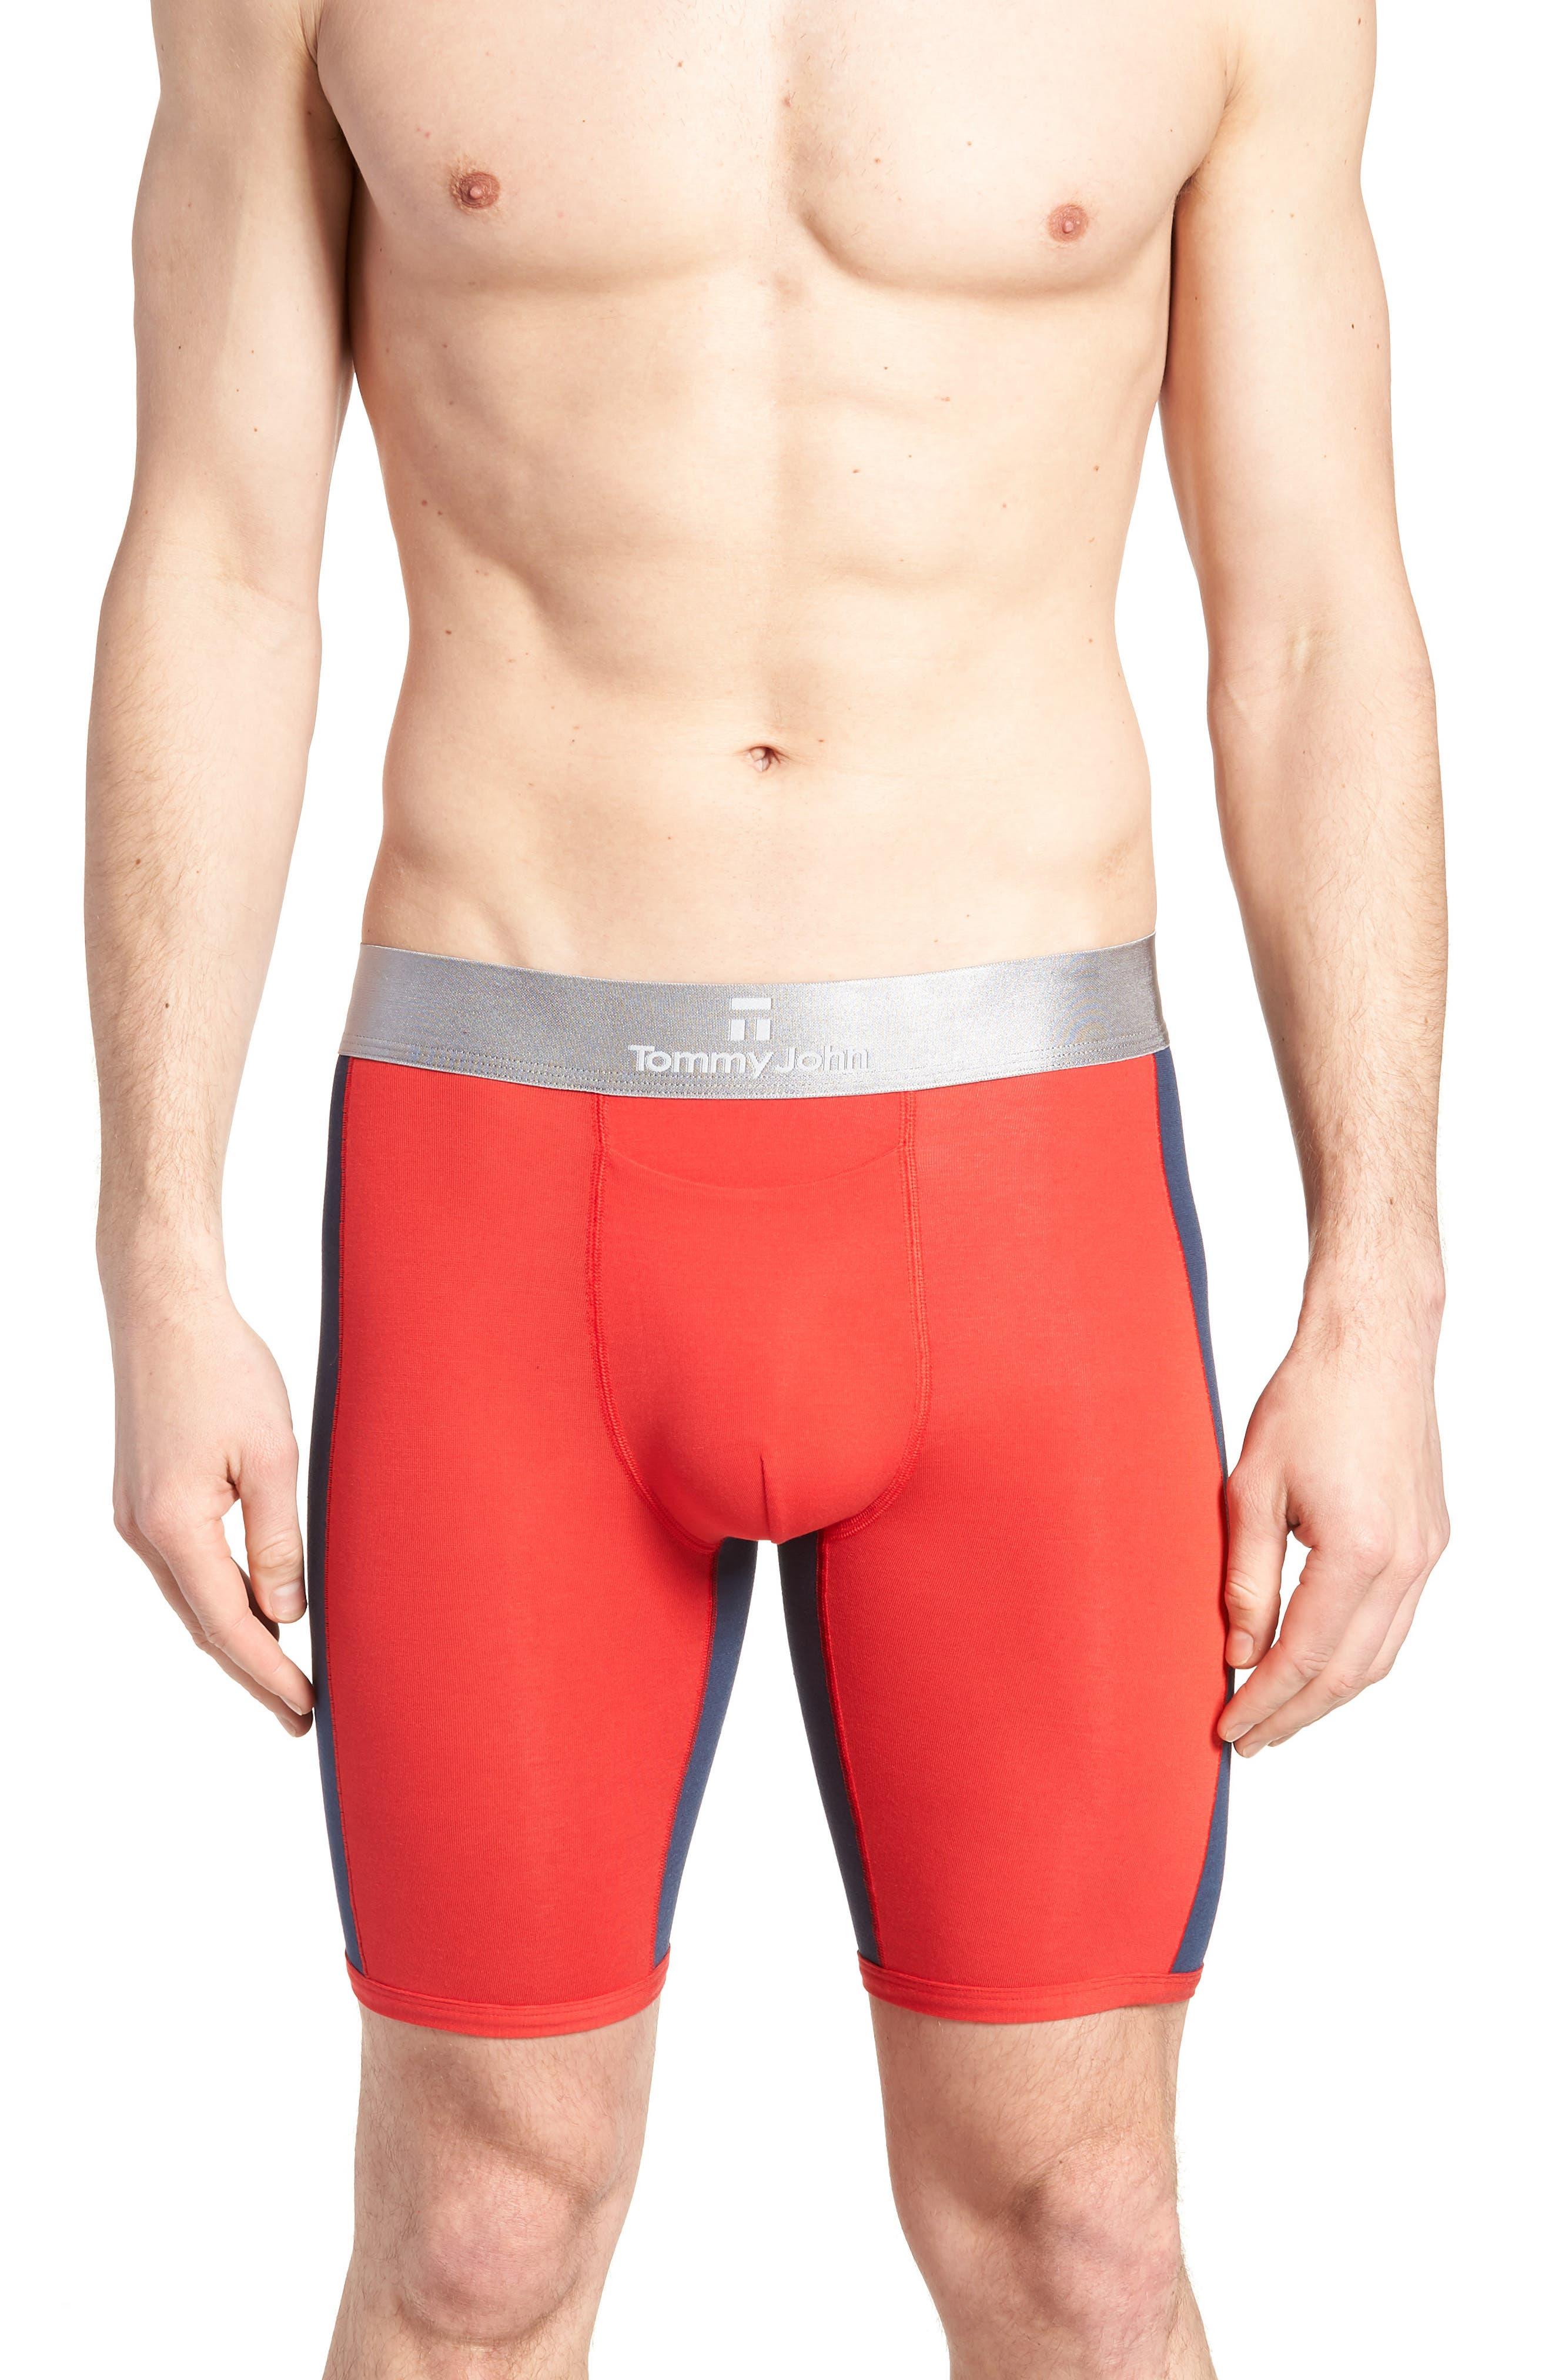 Second Skin Boxer Briefs,                         Main,                         color, True Red/ Dress Blue